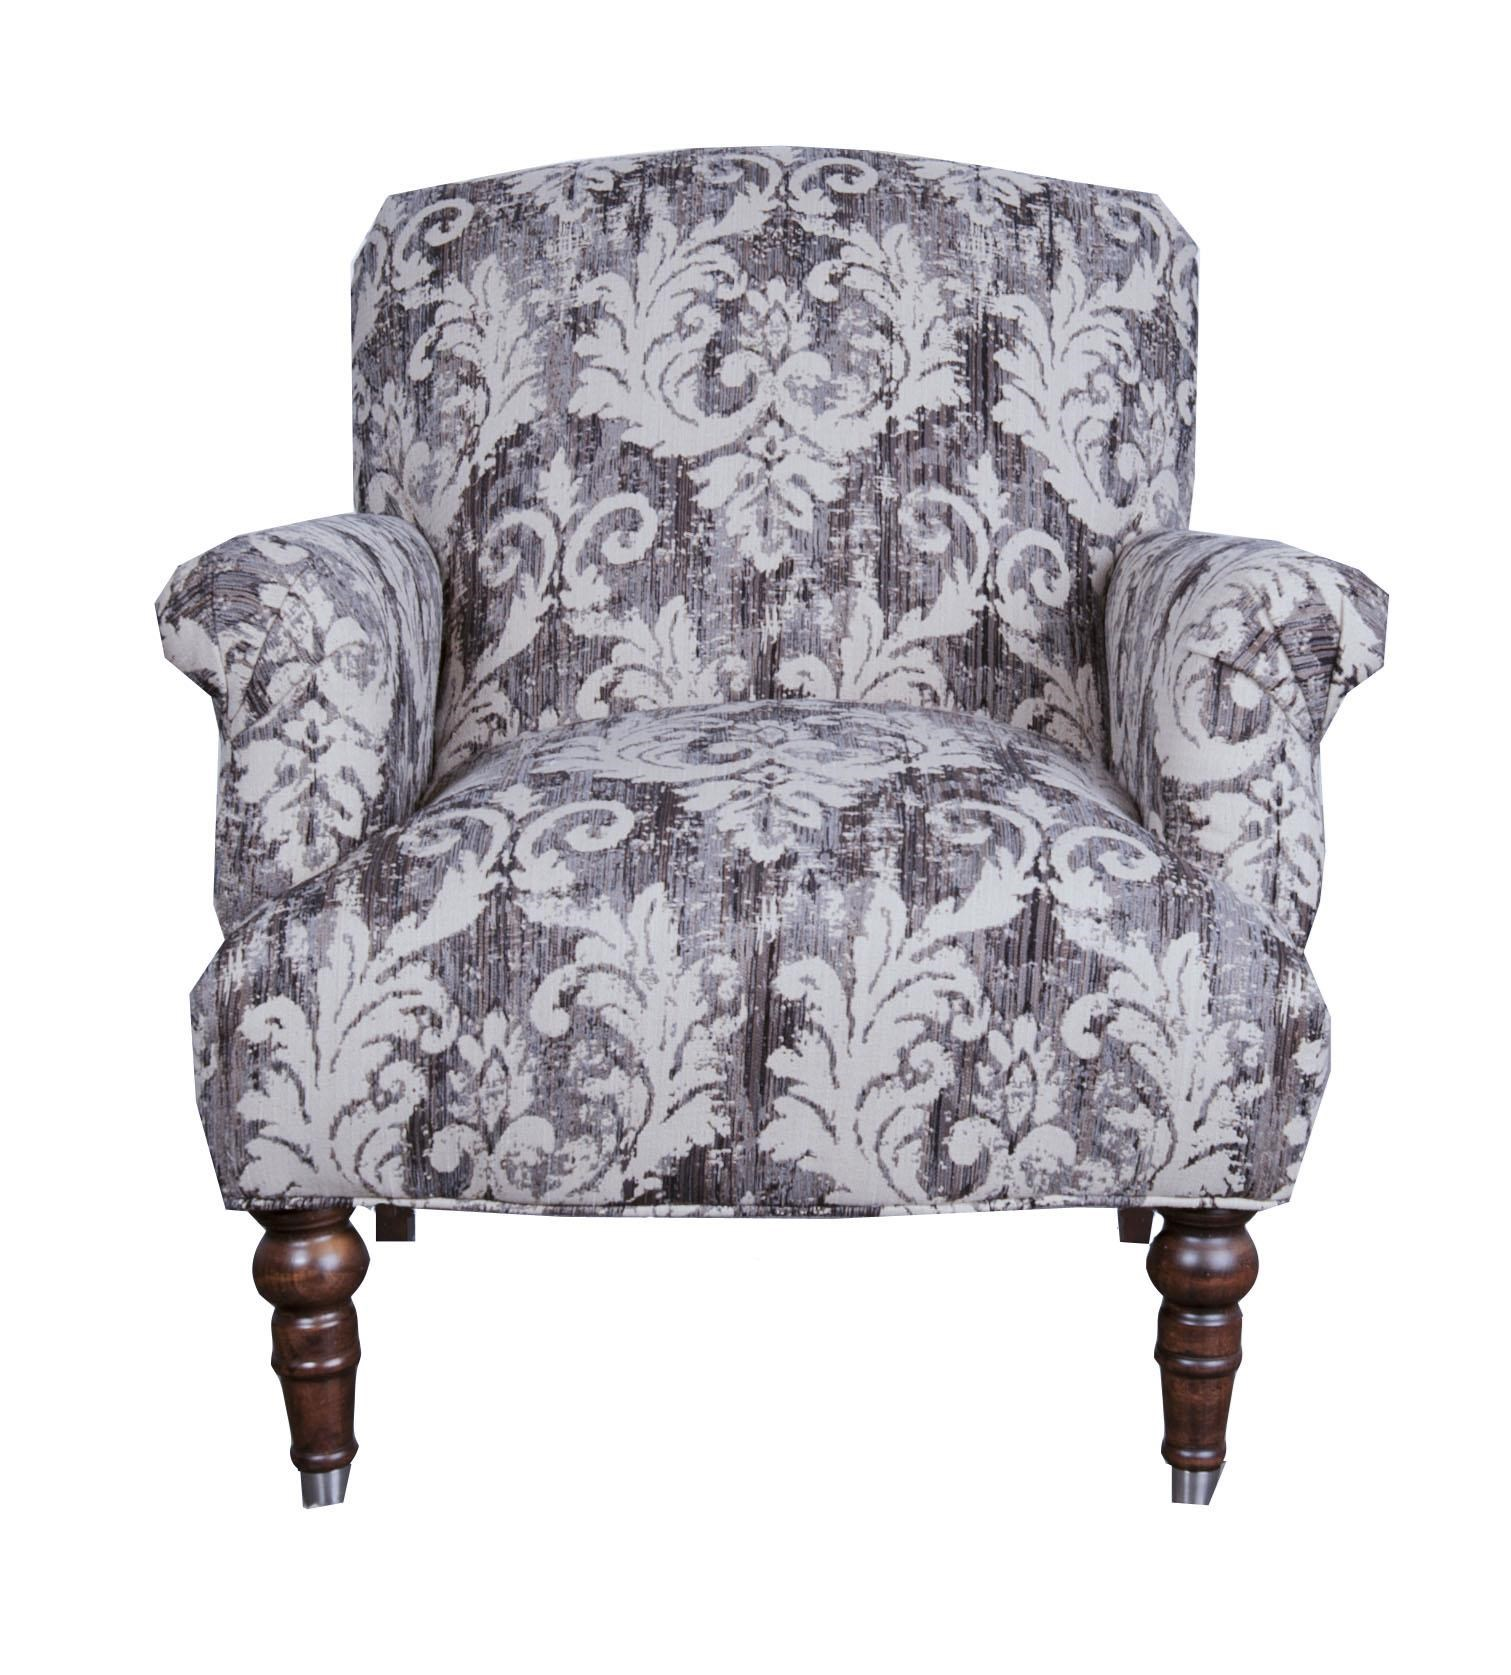 Morris Home Furnishings Upstate Upstate Chair - Item Number: 789029523